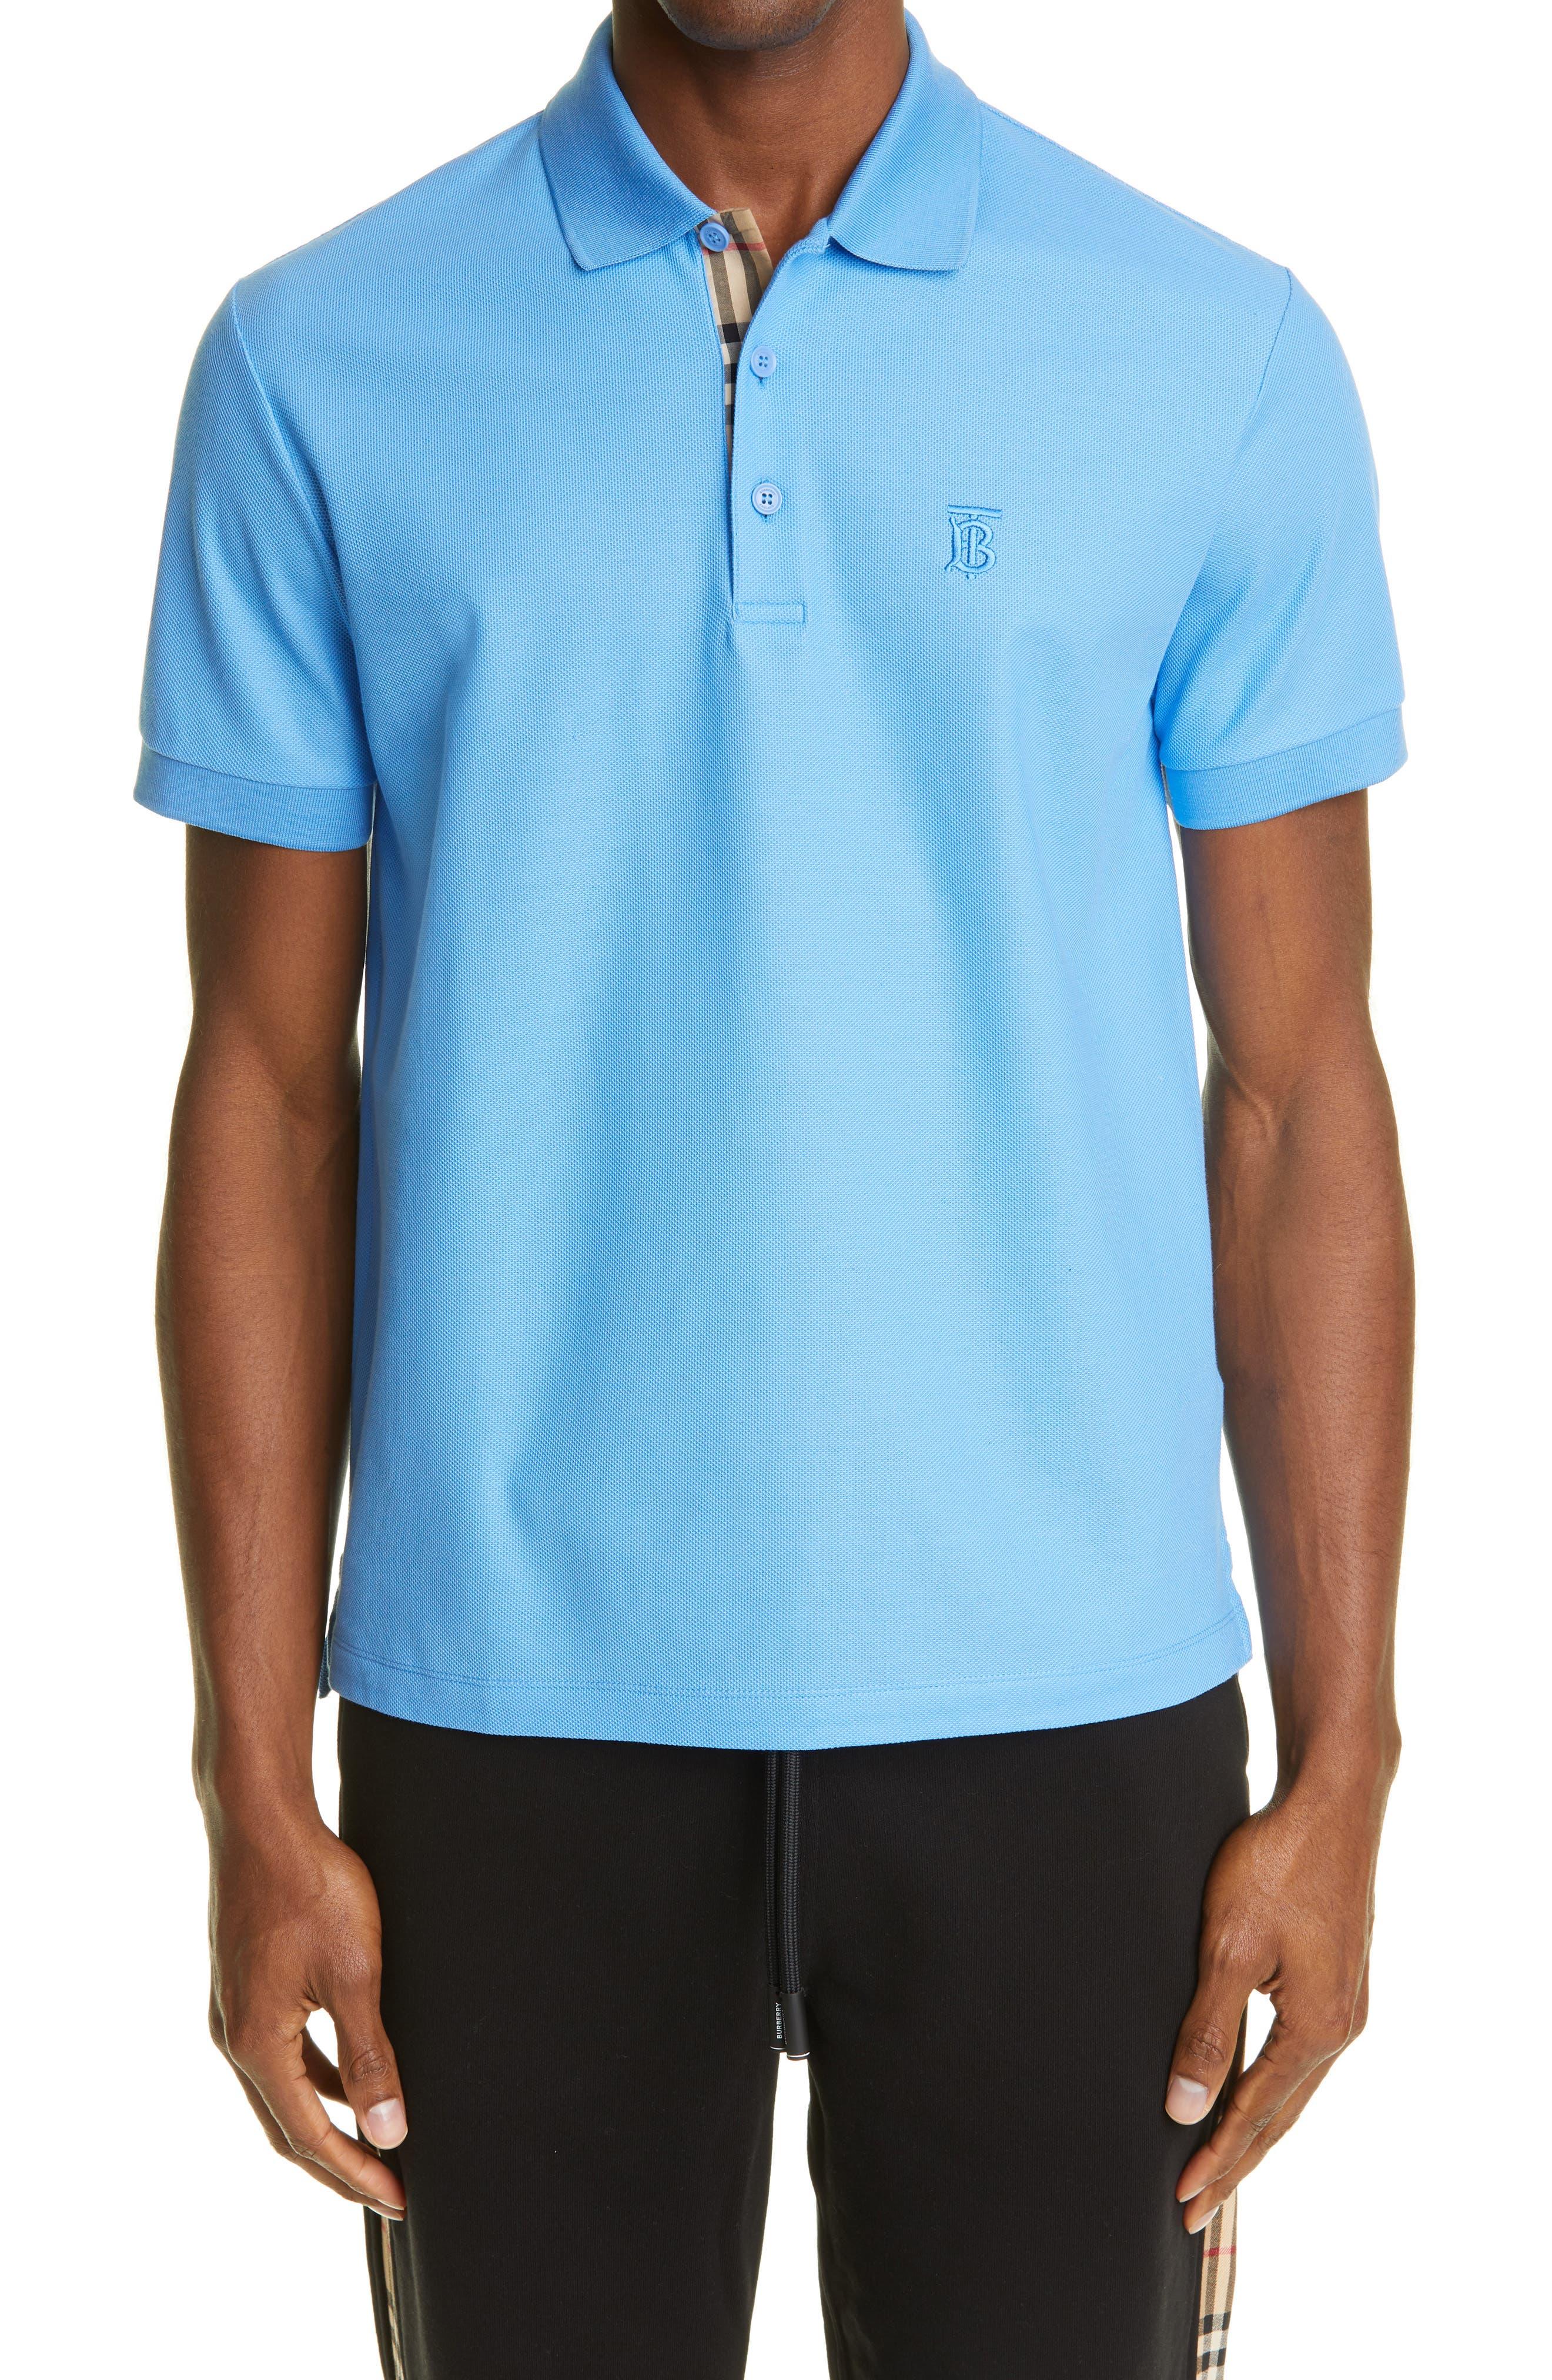 Slim Fit Designer Polo Shirts for Men: Short & Long Sleeves ...